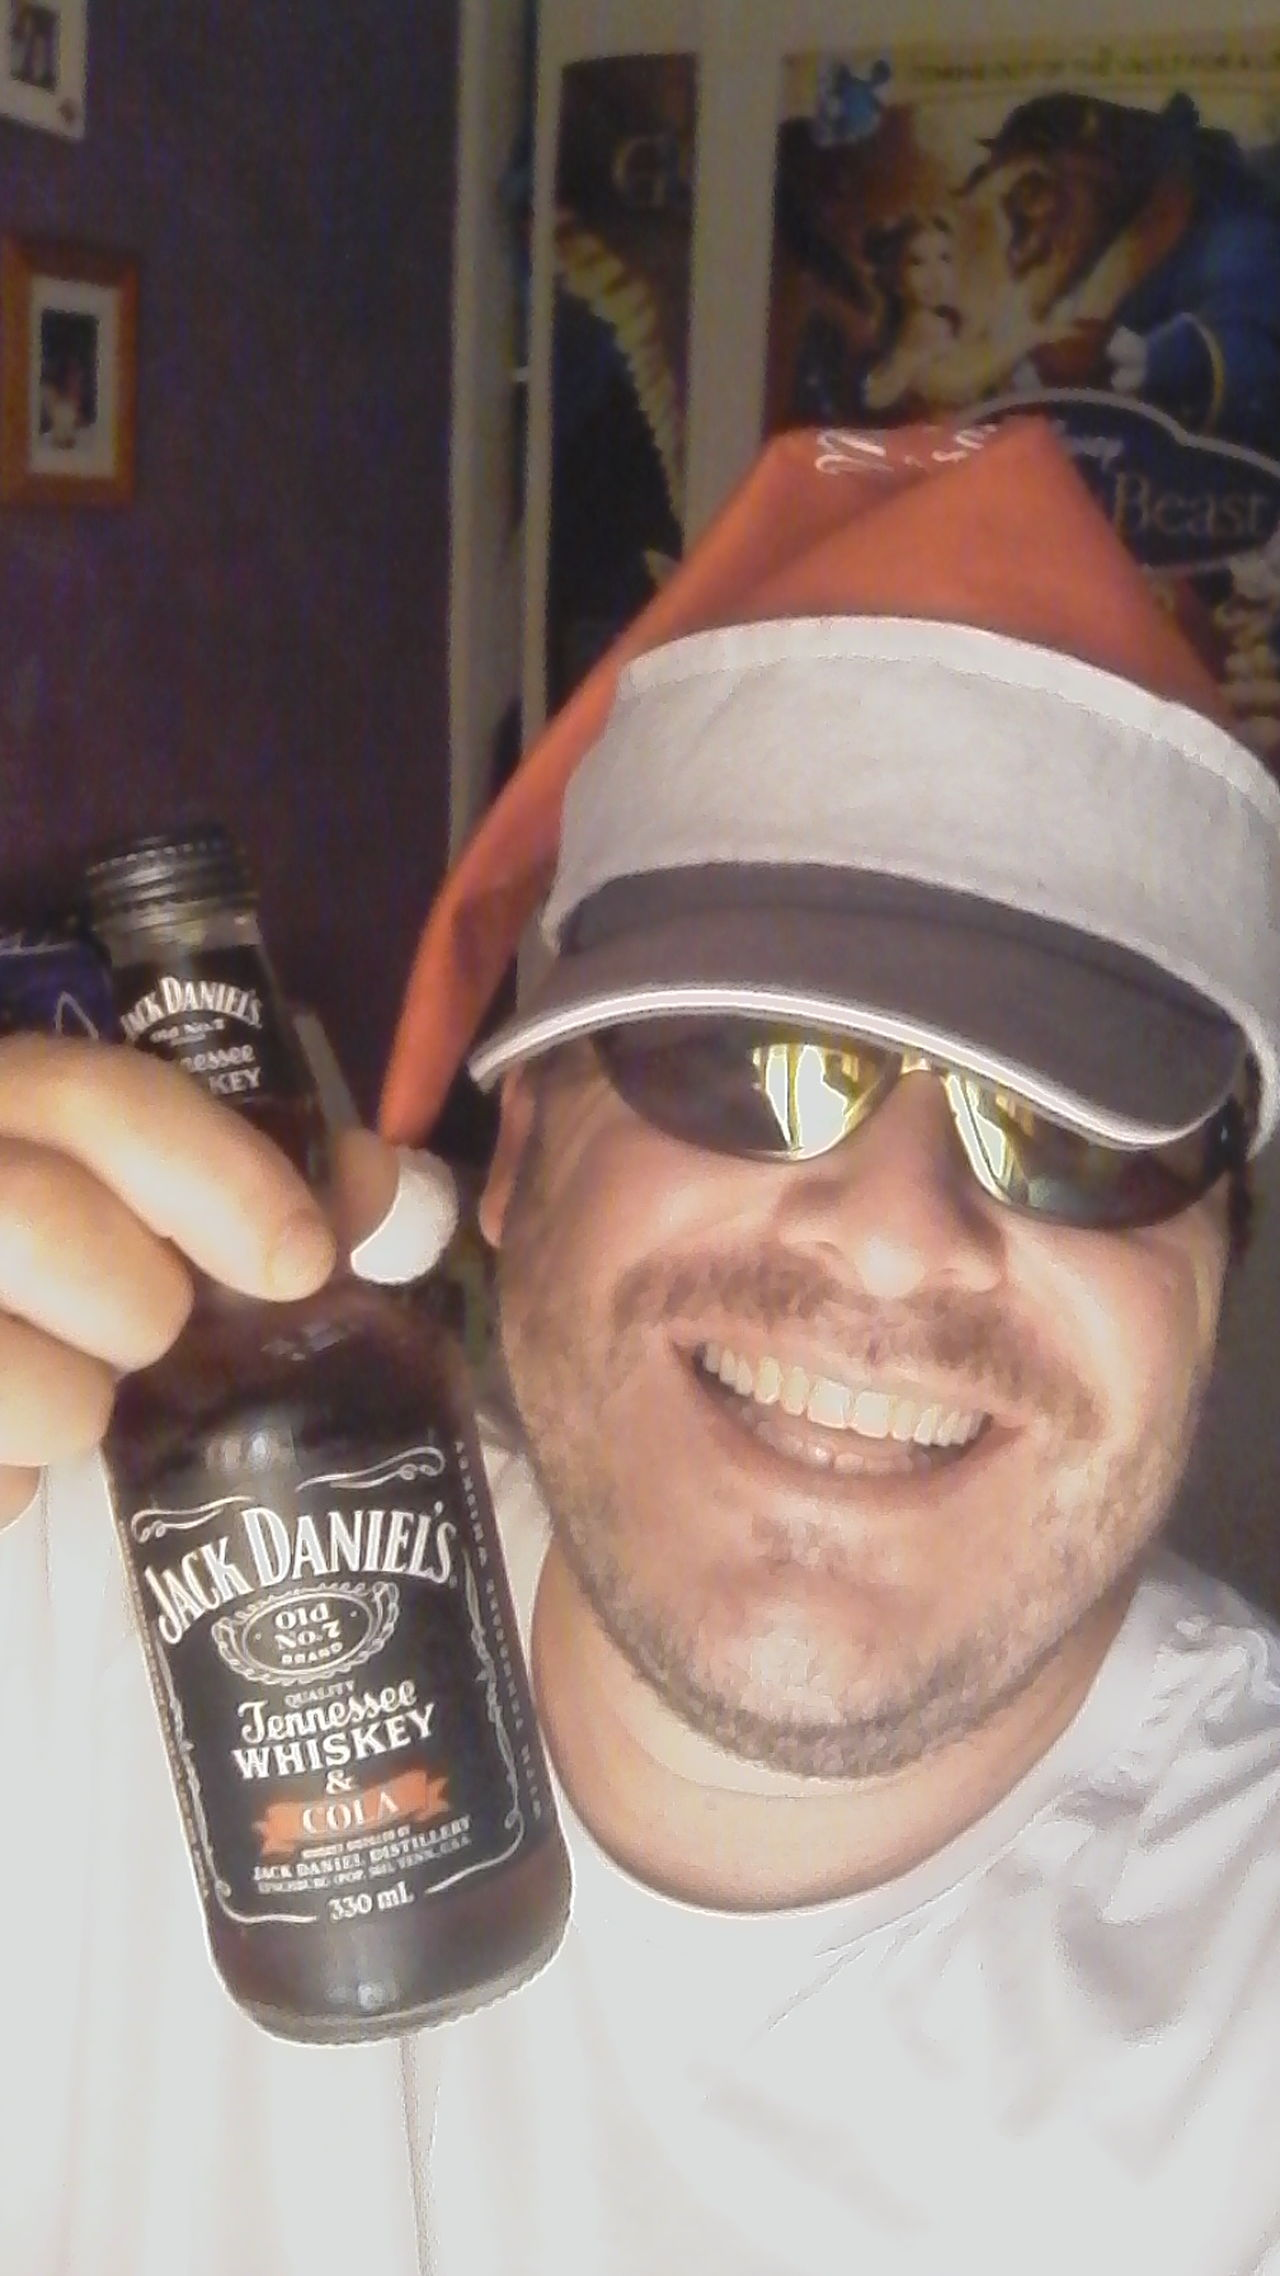 Jack Daniels Whiskey Jack Daniels Christmastime